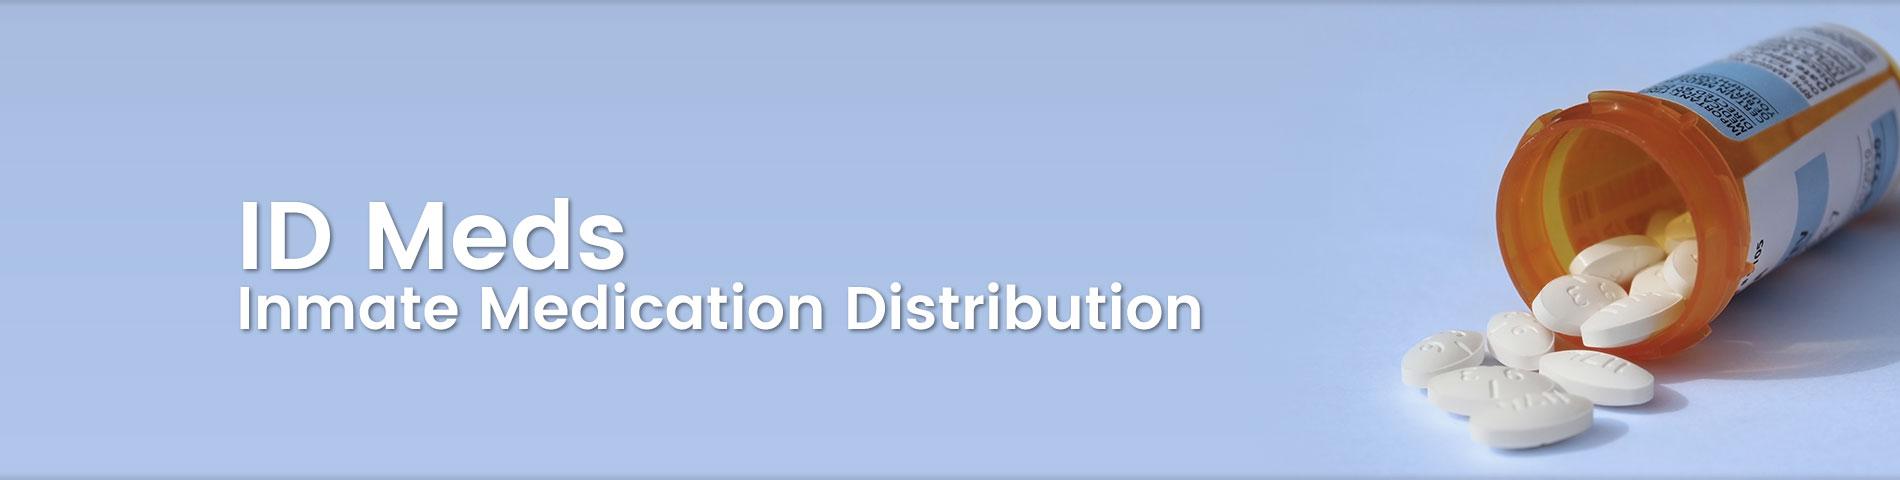 Inmate Medication Distribution Management